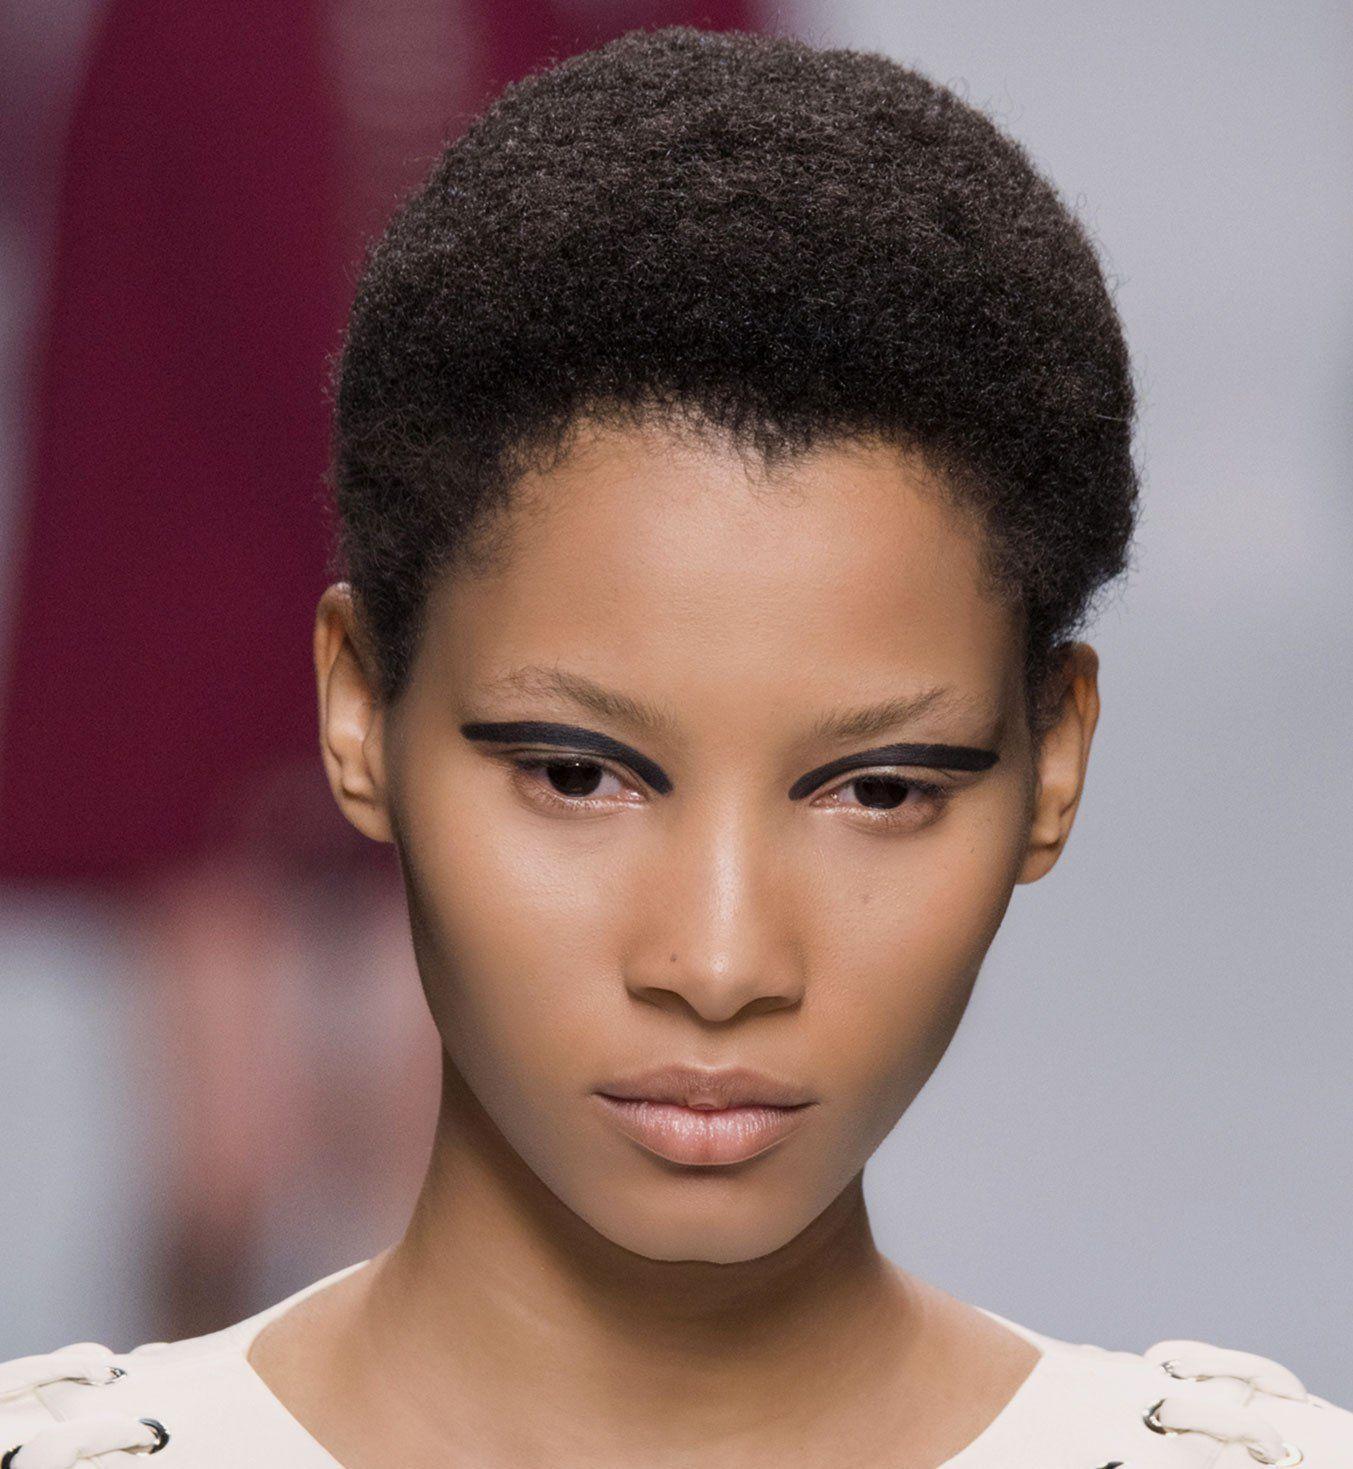 coupe courte afro d fil fendi chevelure coiffure pinterest cheveux cheveux courts afro. Black Bedroom Furniture Sets. Home Design Ideas